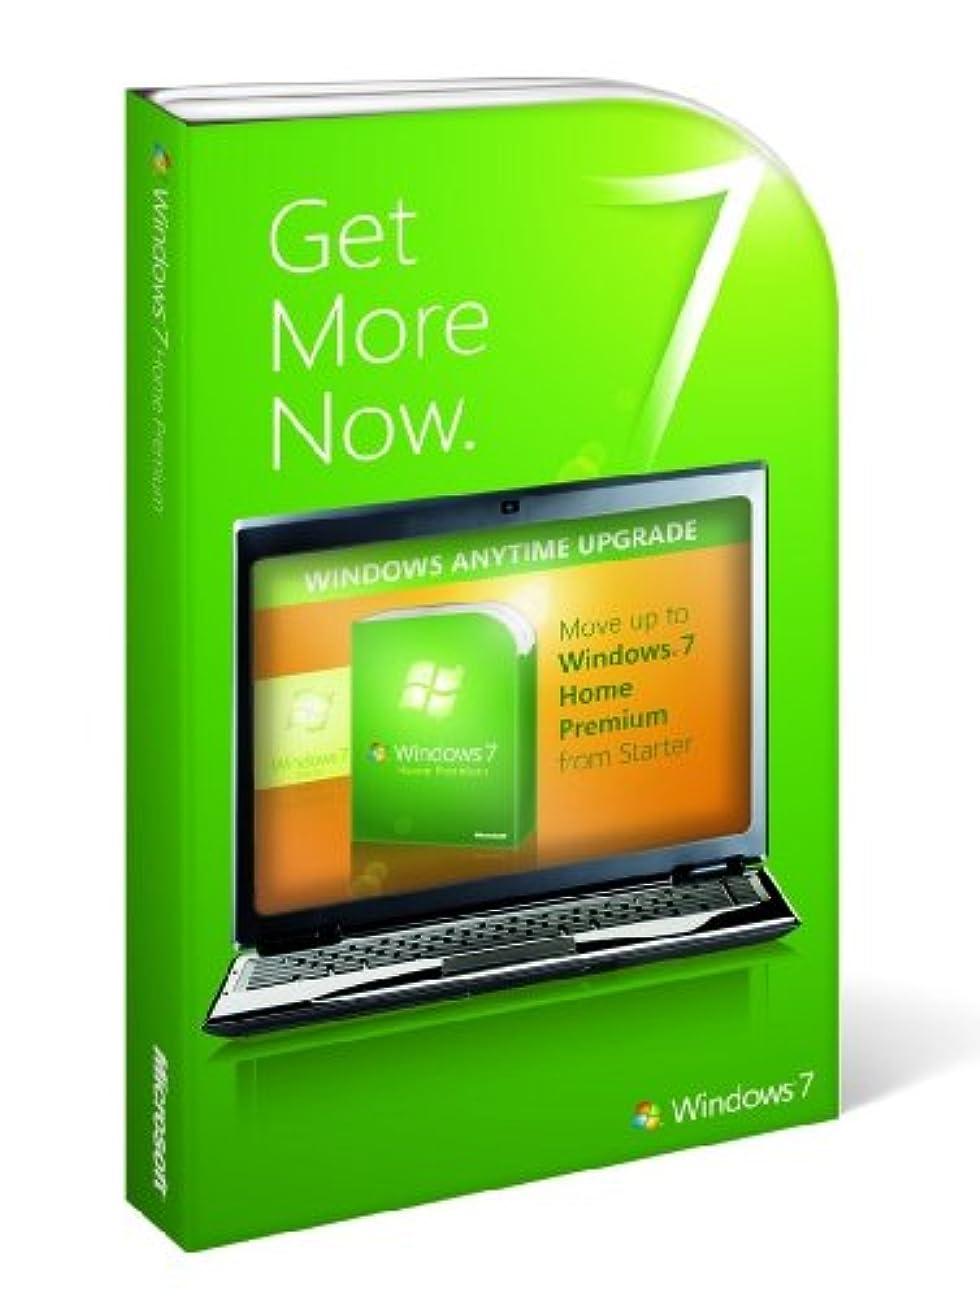 Windows 7 StepUpgrade Starter to Home Premium 英語版 アップグレード 【プロダクトキー】